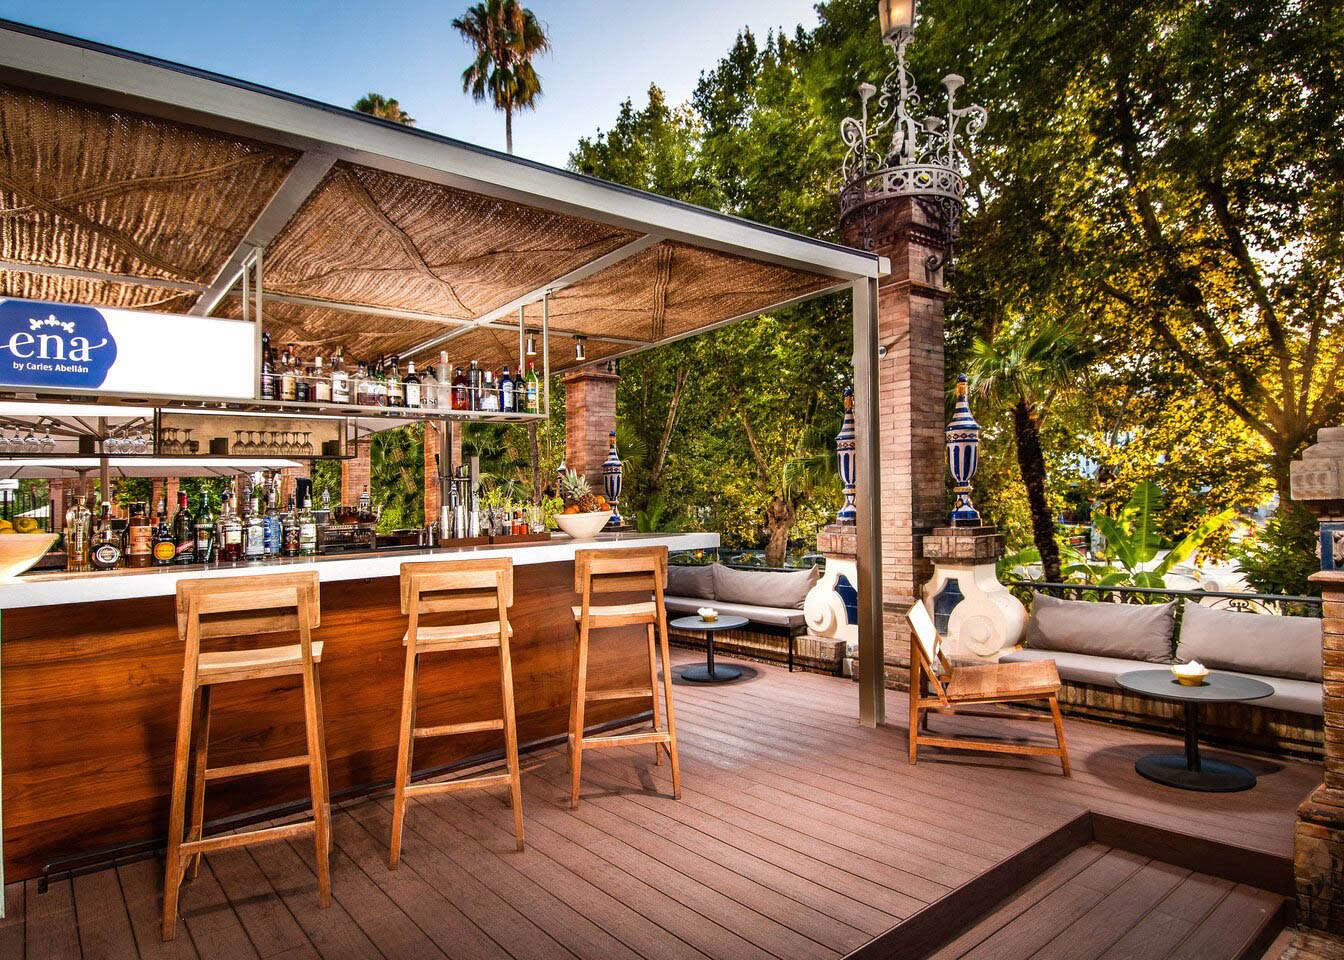 Ena restaurant outdoors